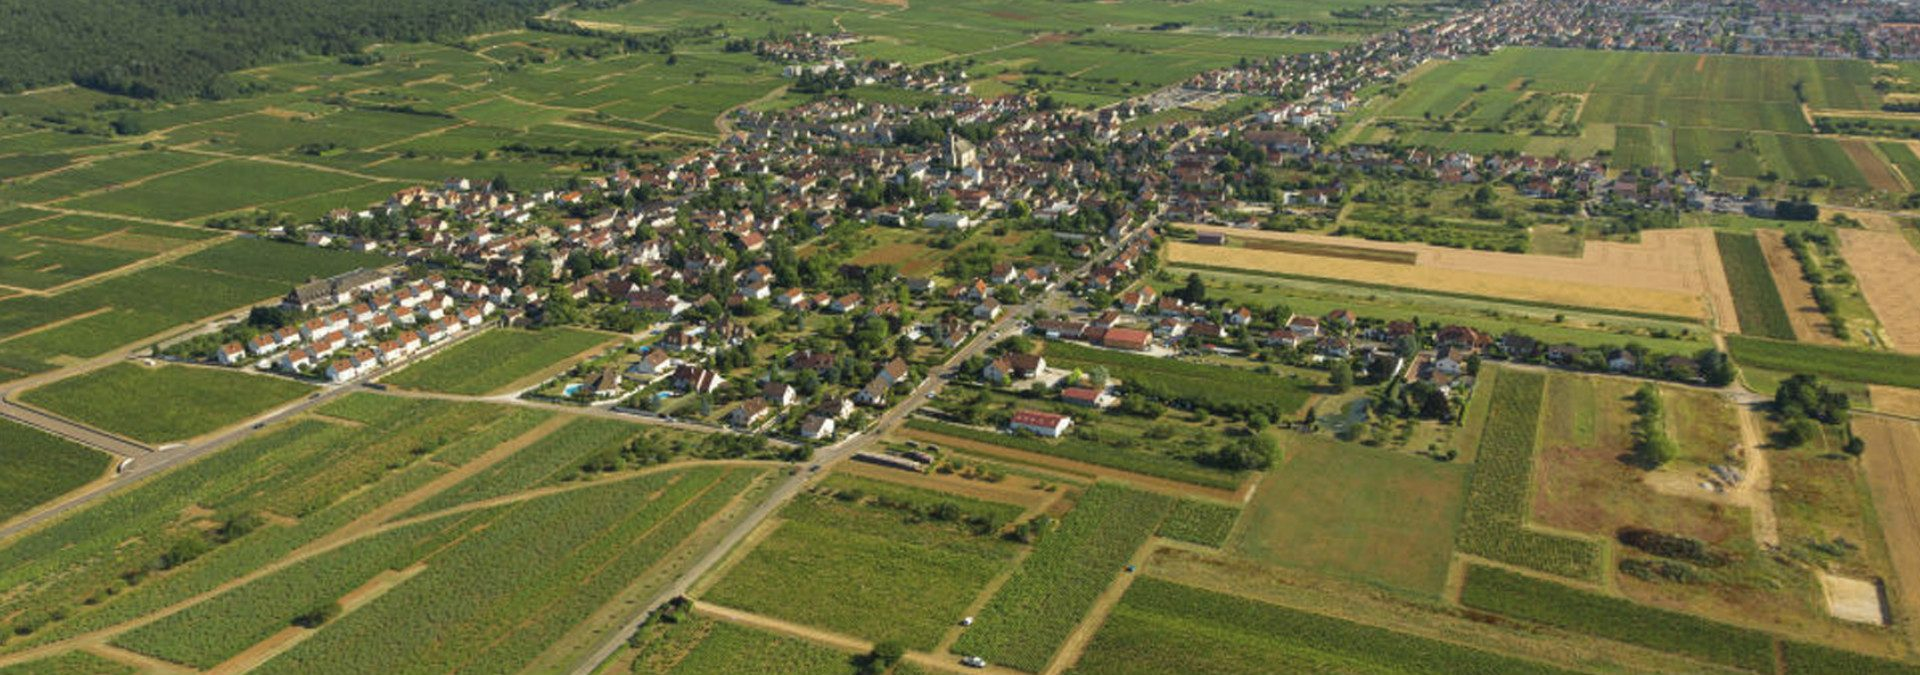 Domaine Guyot